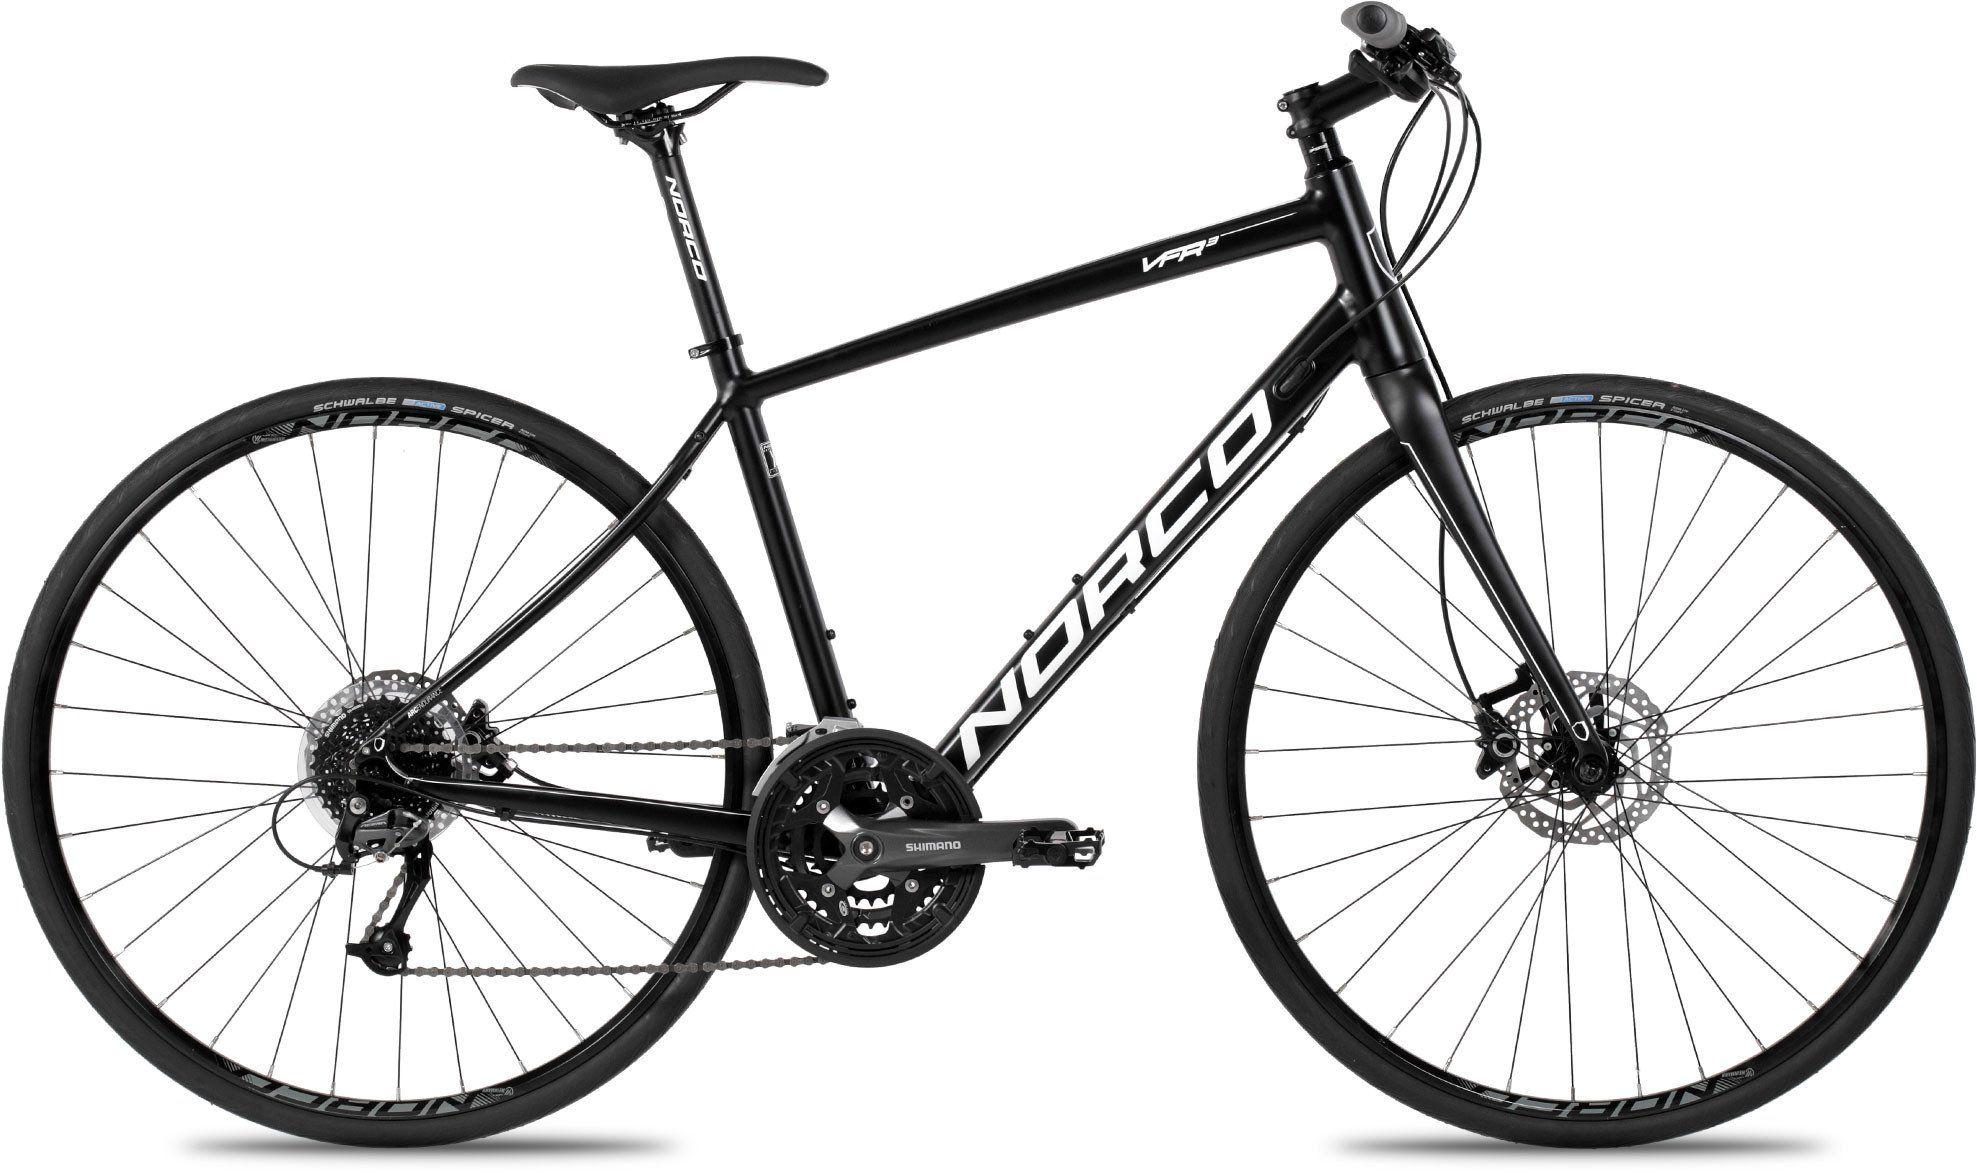 Bikes frames for sale, Shop wholesale bike frames, bicycle parts ...